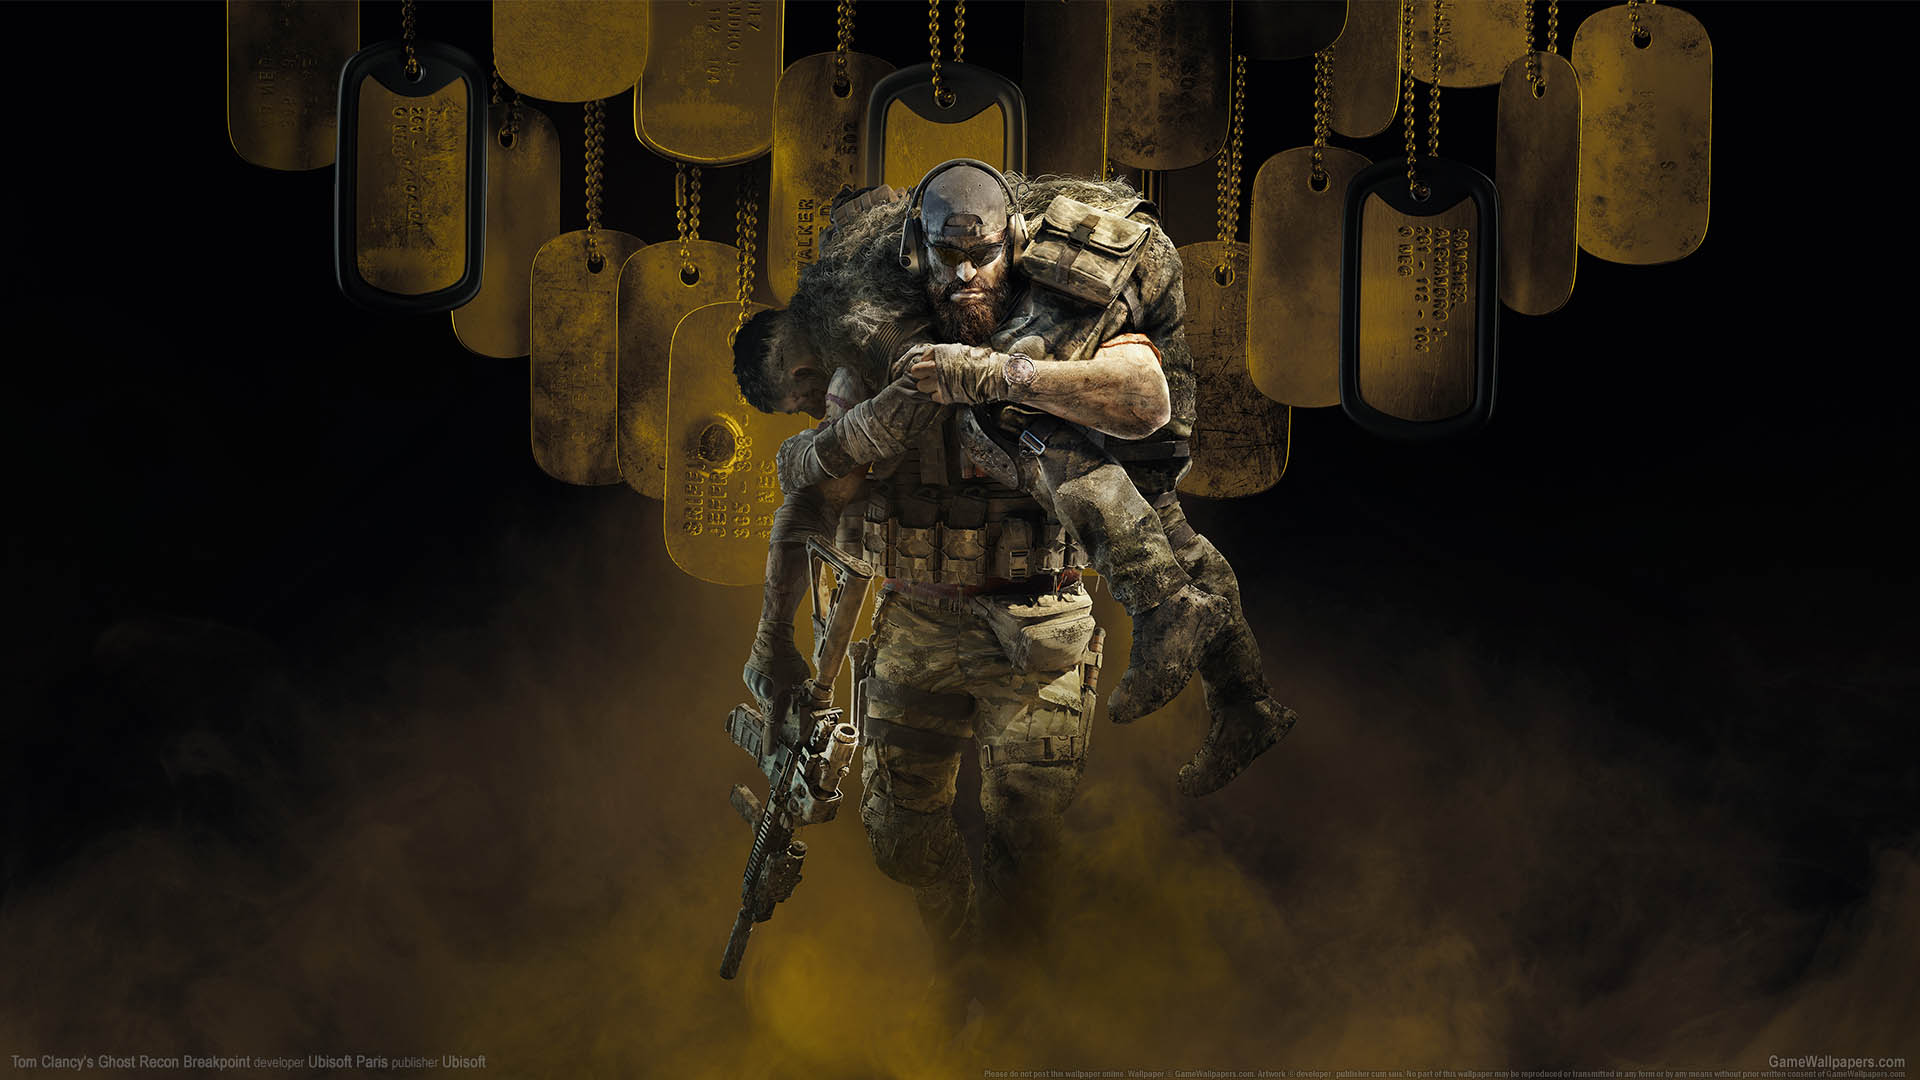 Tom Clancy's Ghost Recon Breakpoint wallpaper 01 1920x1080